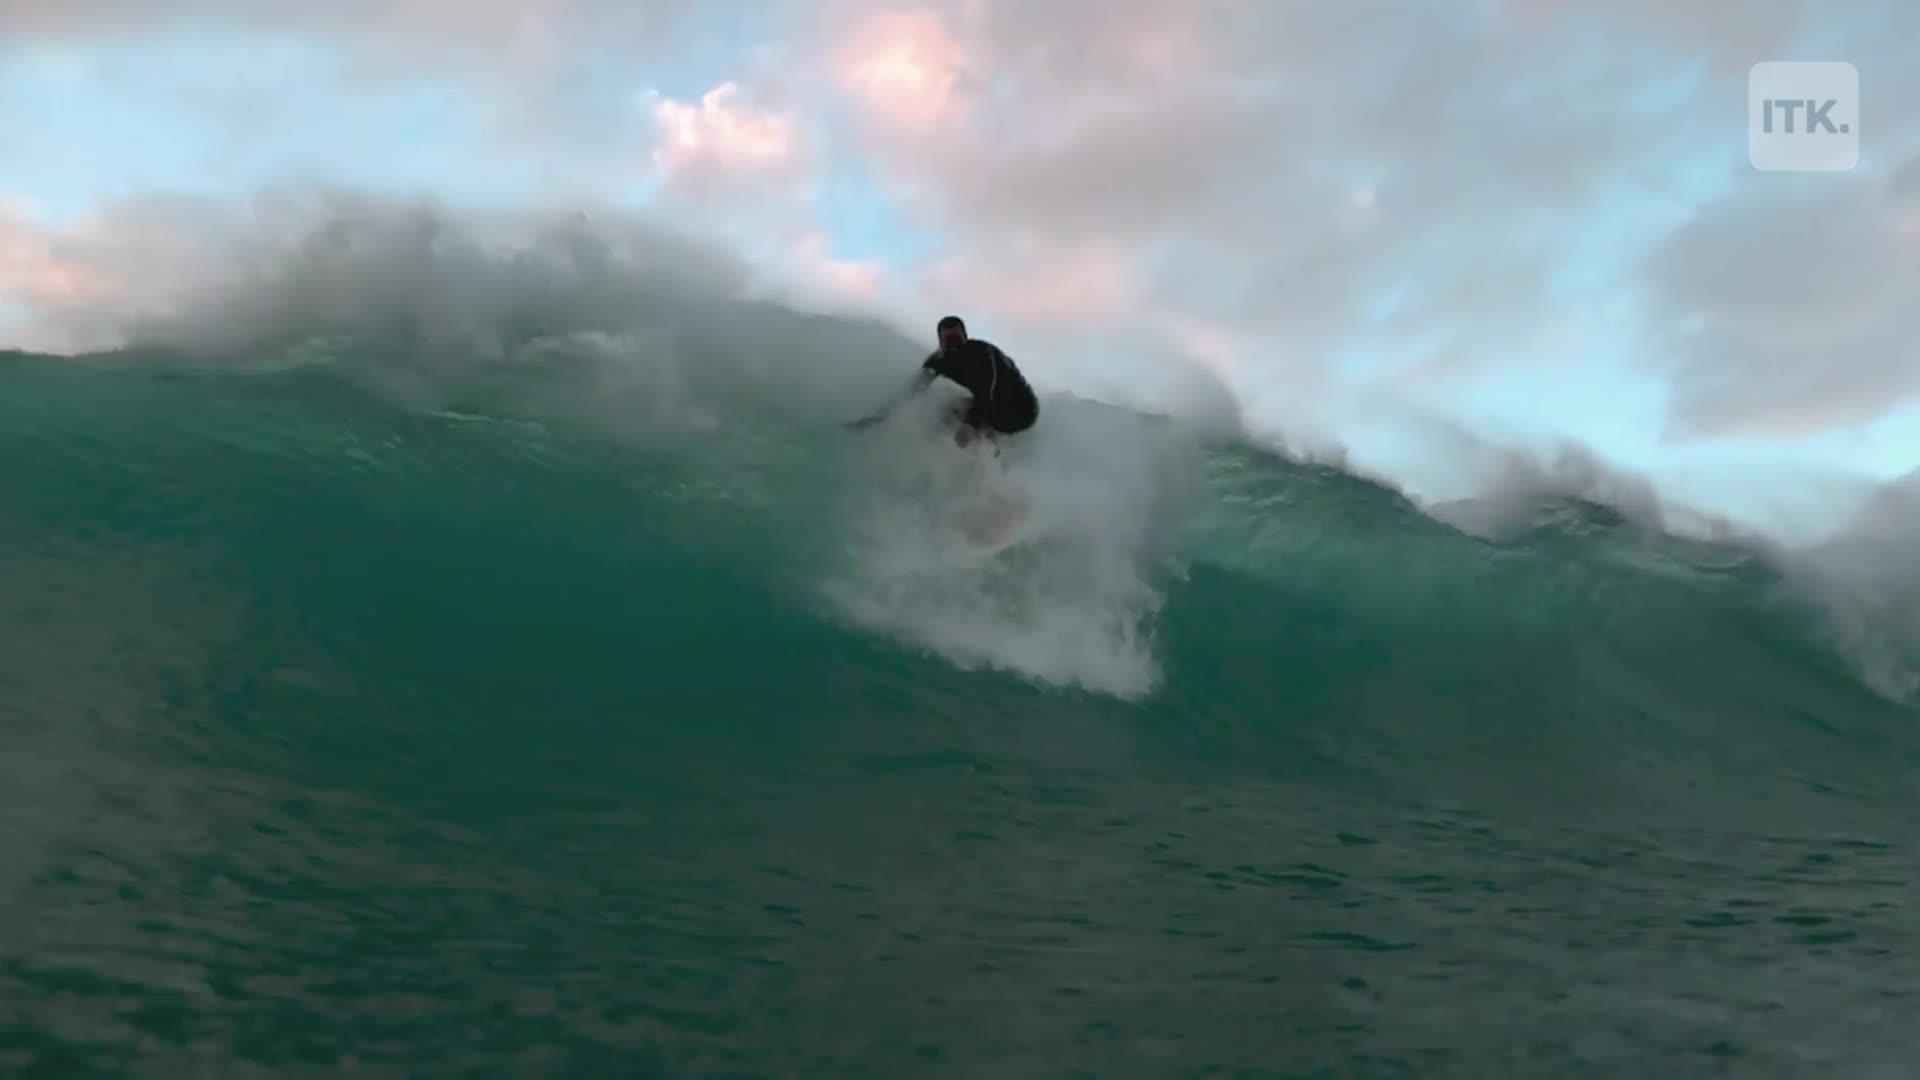 Man turns 10,000 cigarette butts into stunning surfboard